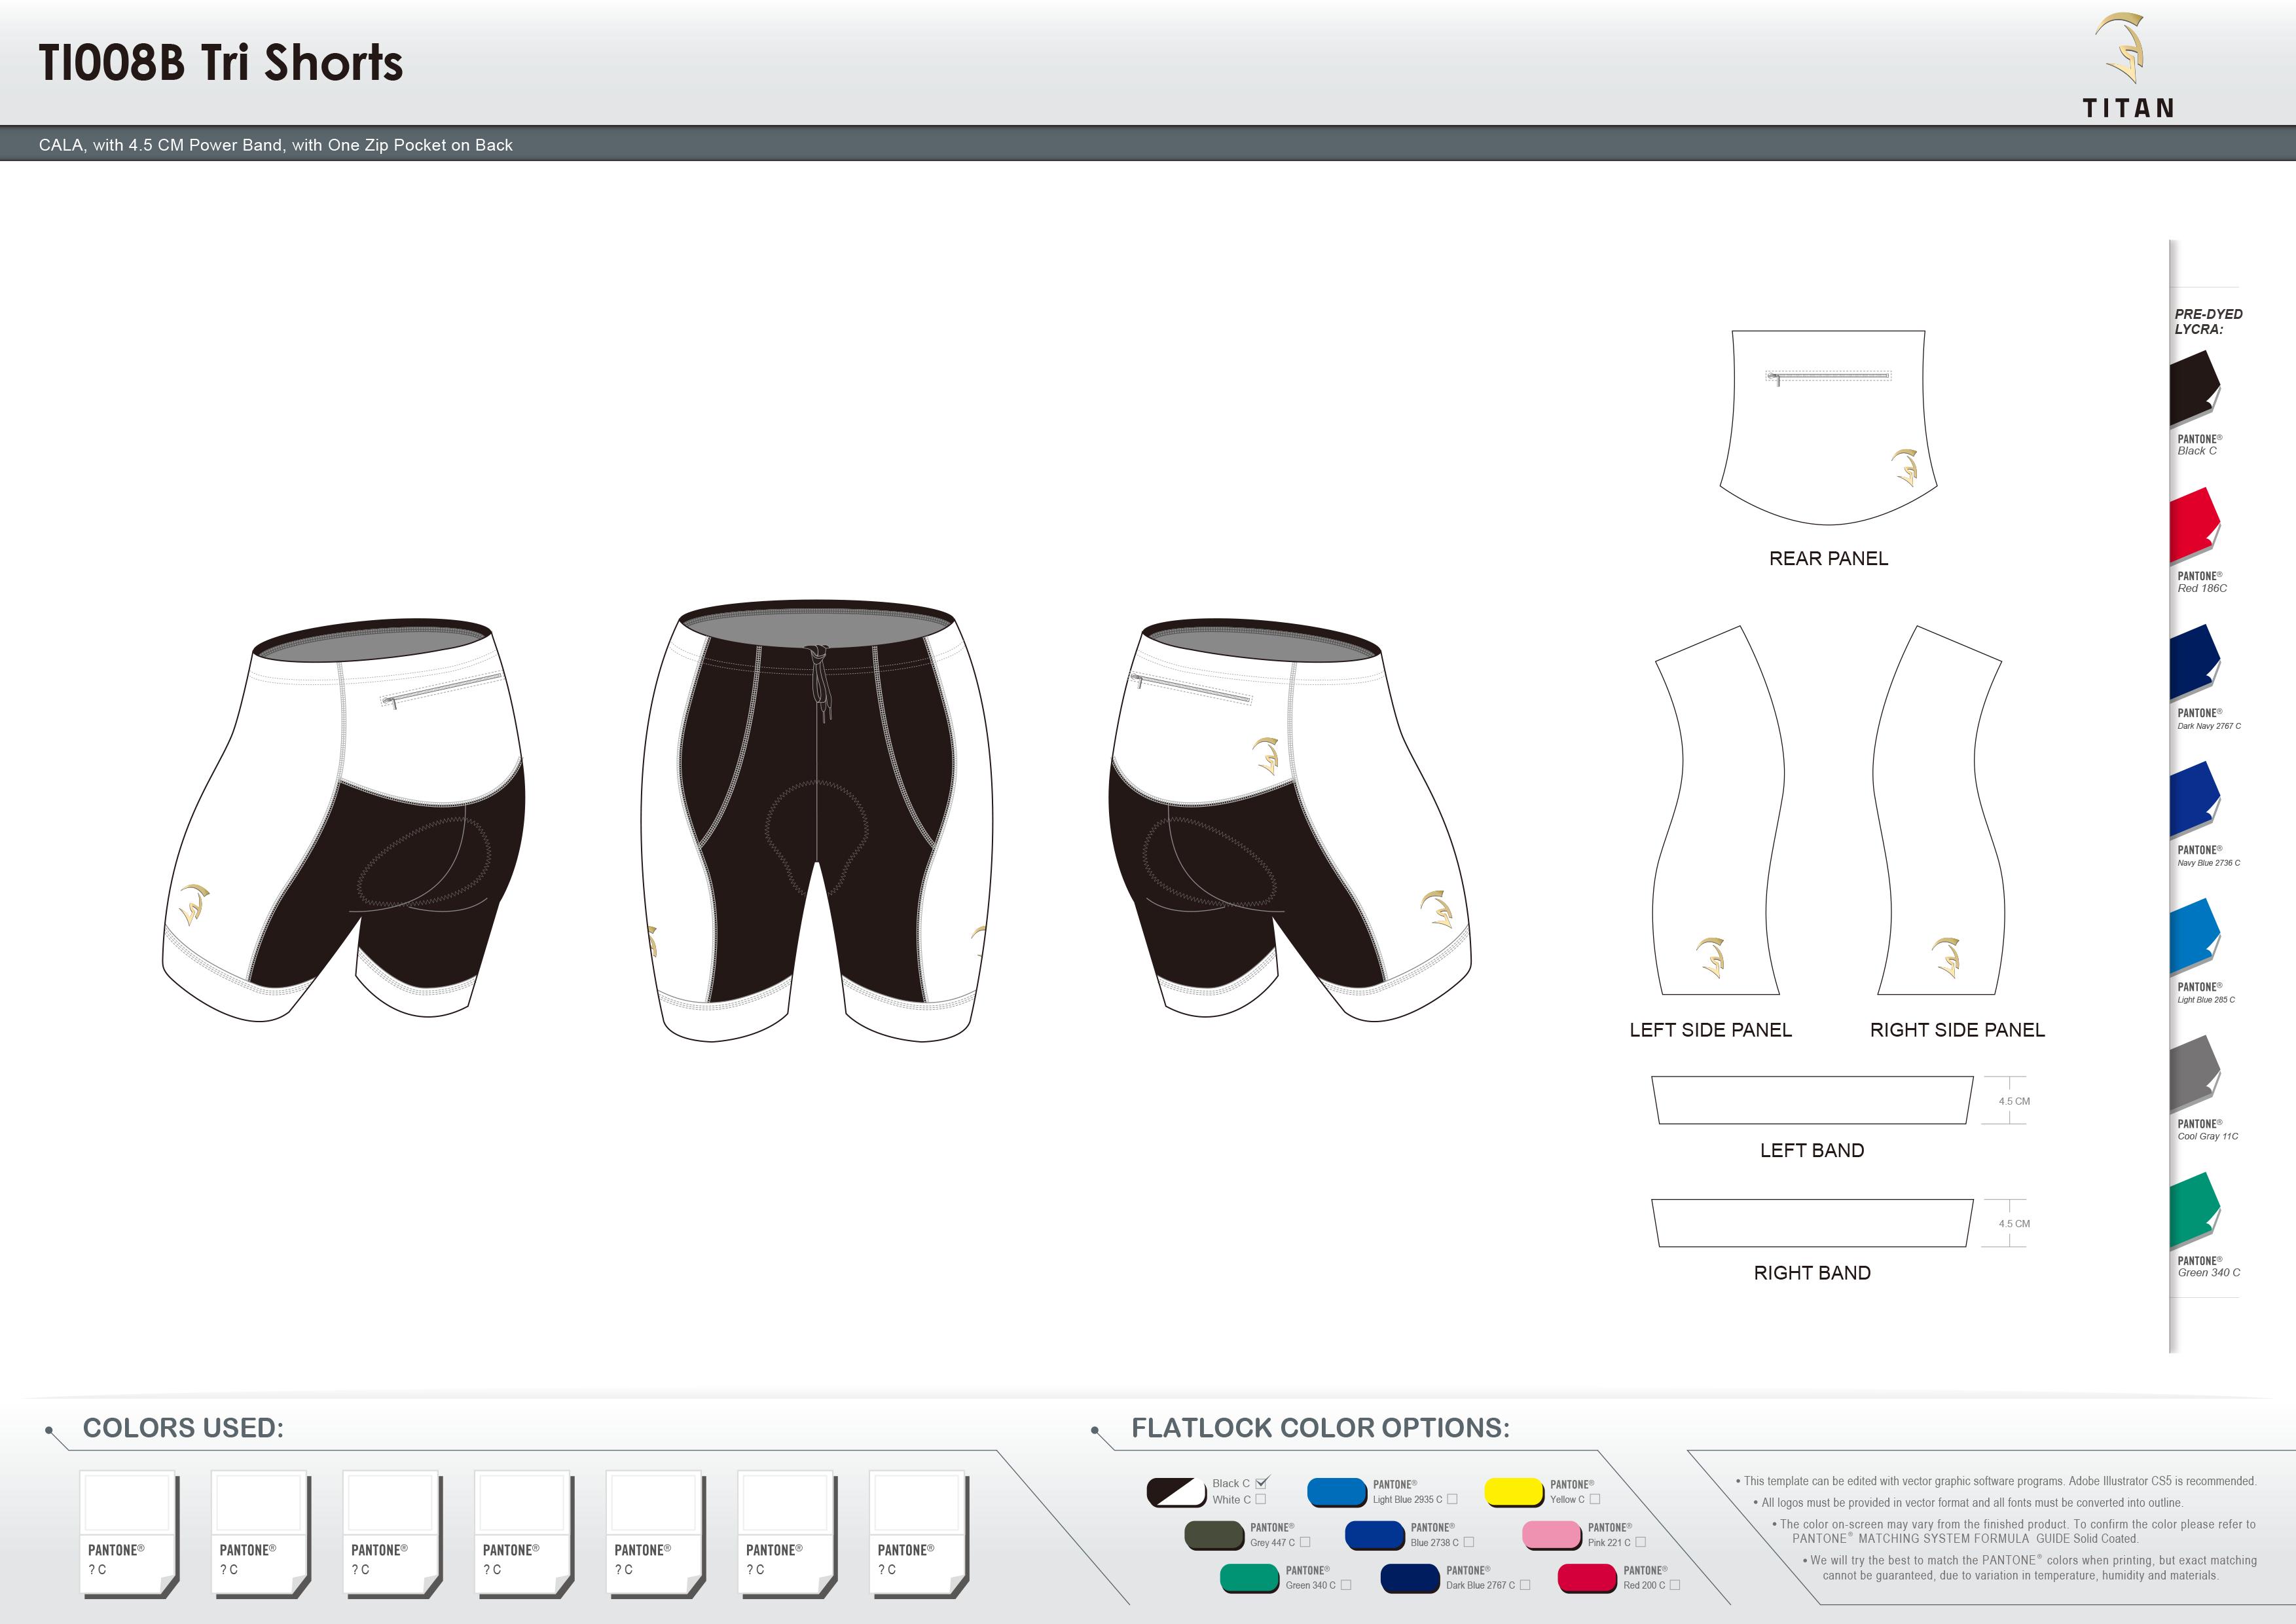 TI008B Tri Shorts with One Rear Zip Pocket